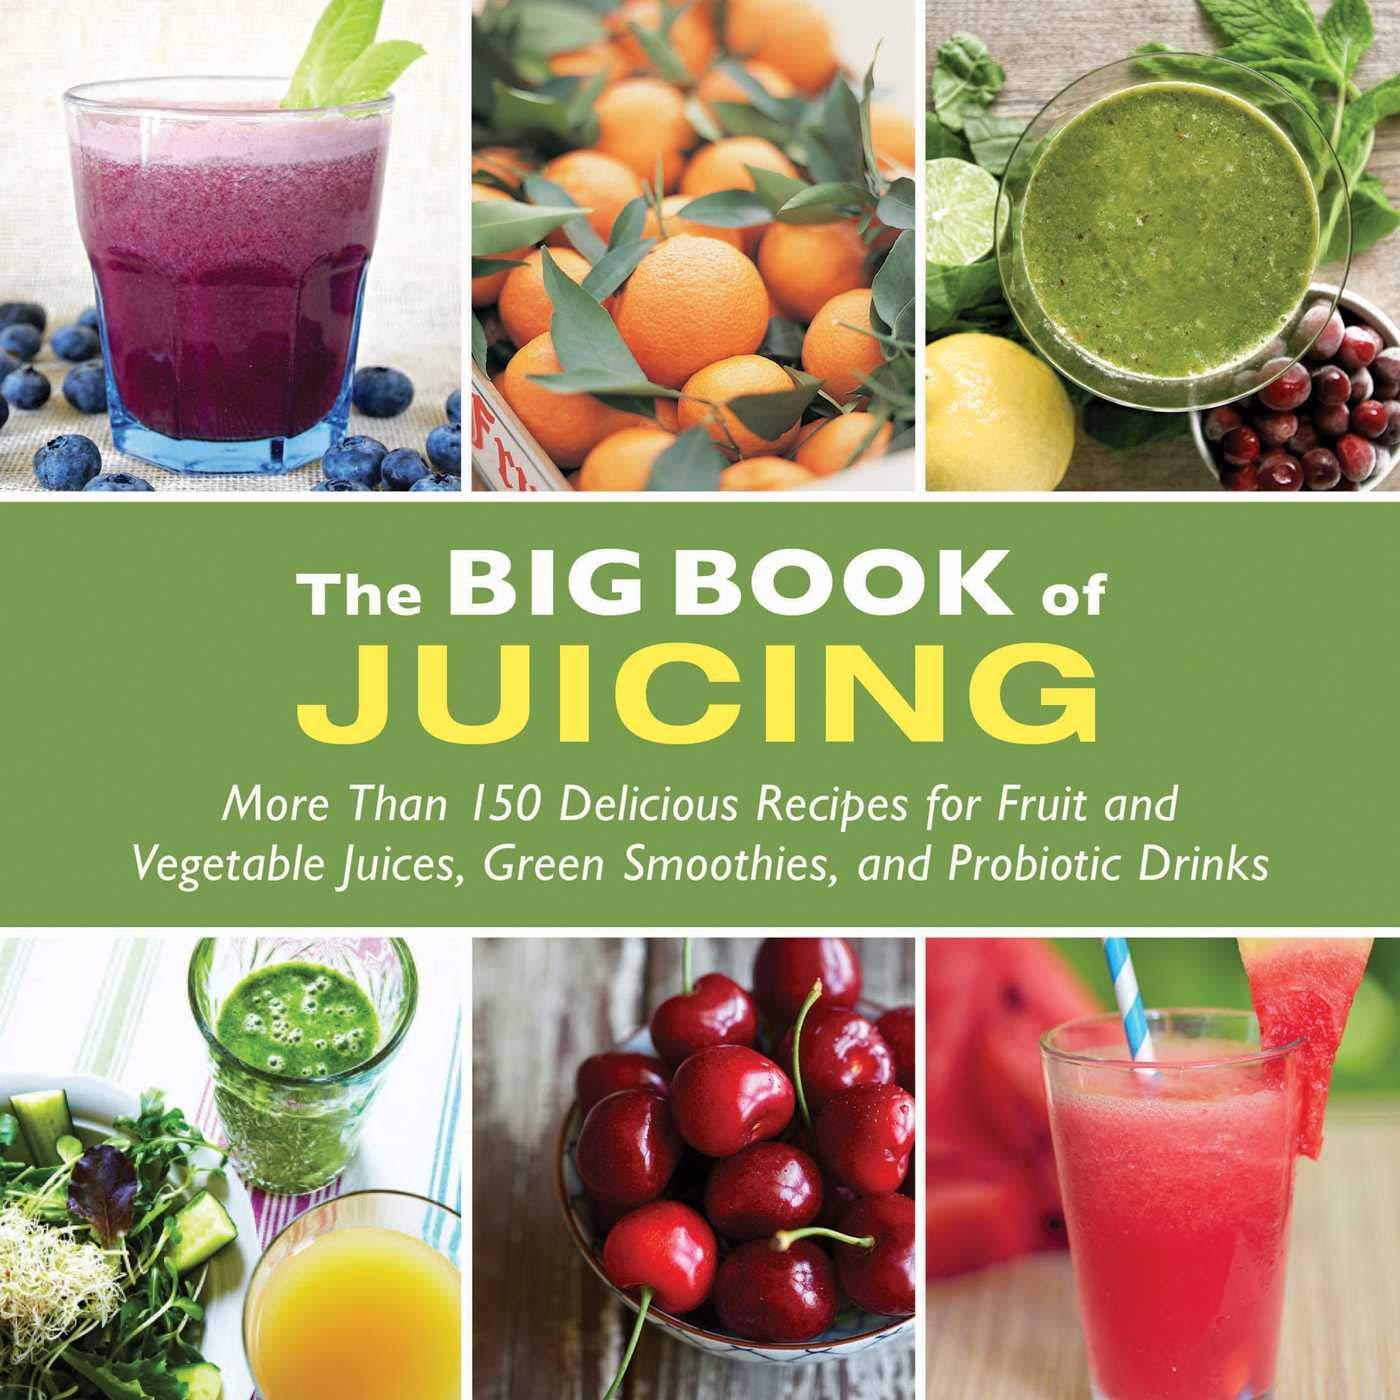 Top 10 Best juicer books recipes Reviews